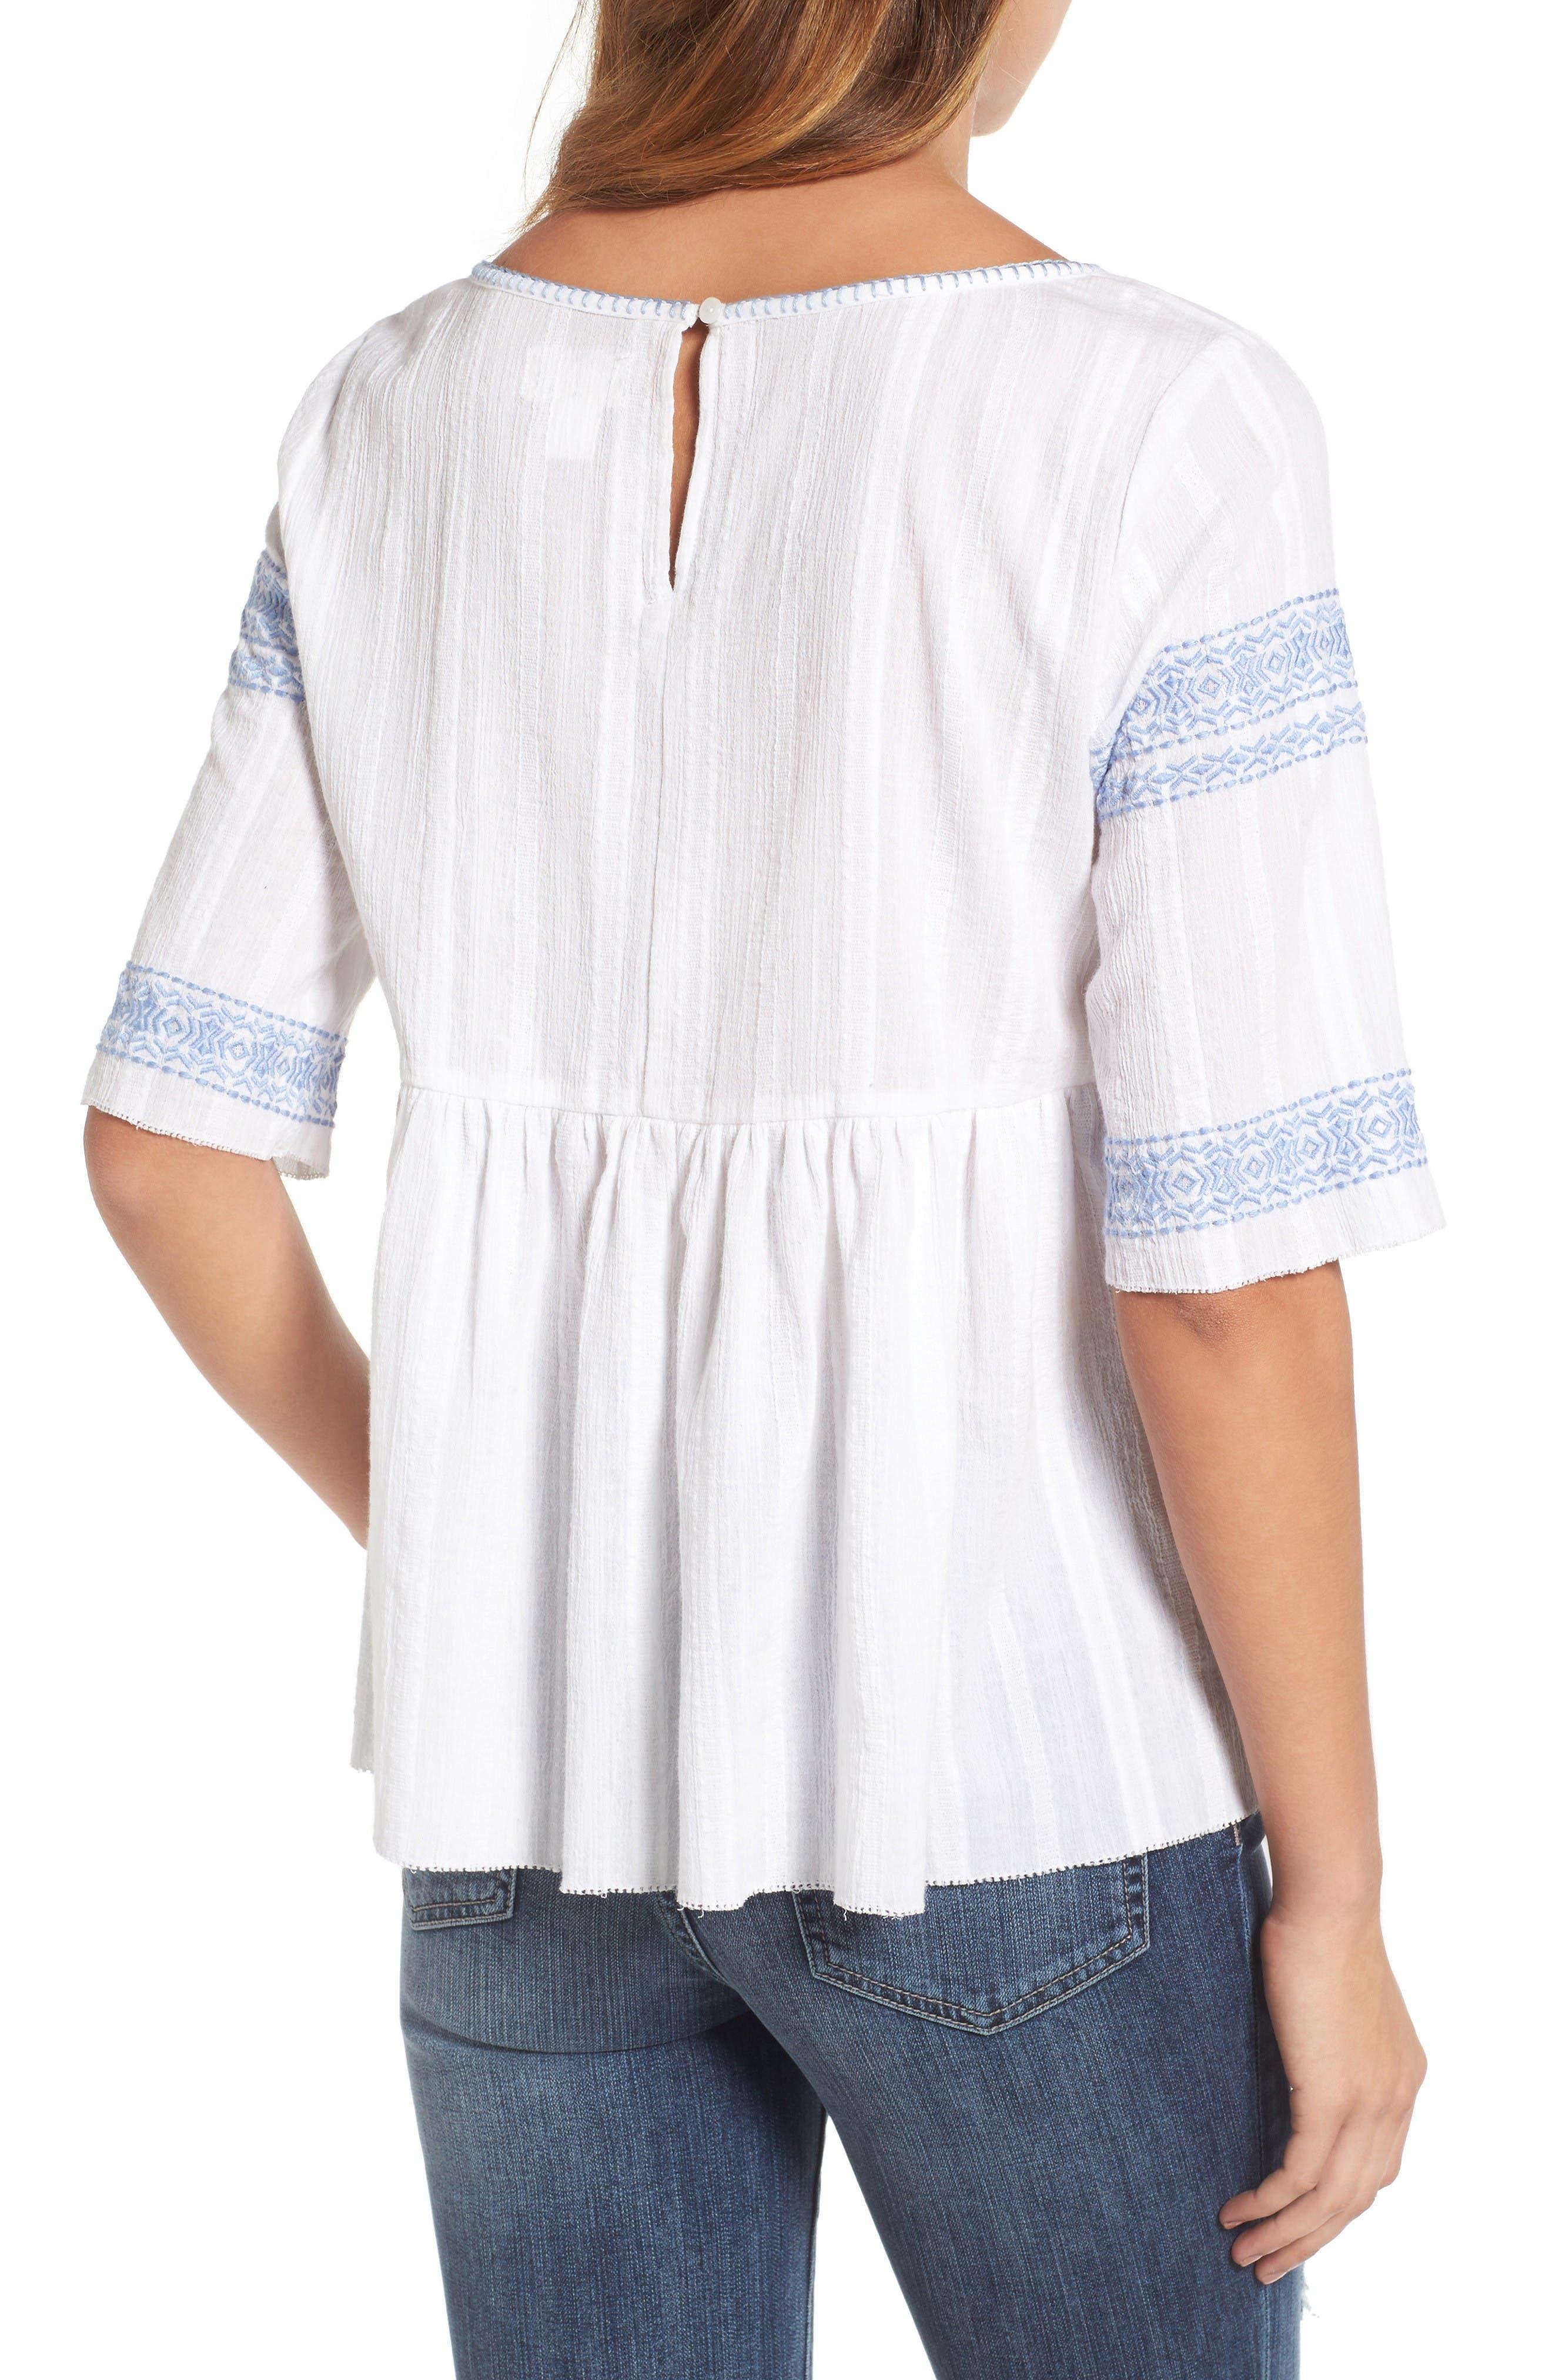 Alternate Image 2  - Caslon® Embroidered Babydoll Top (Regular & Petite)